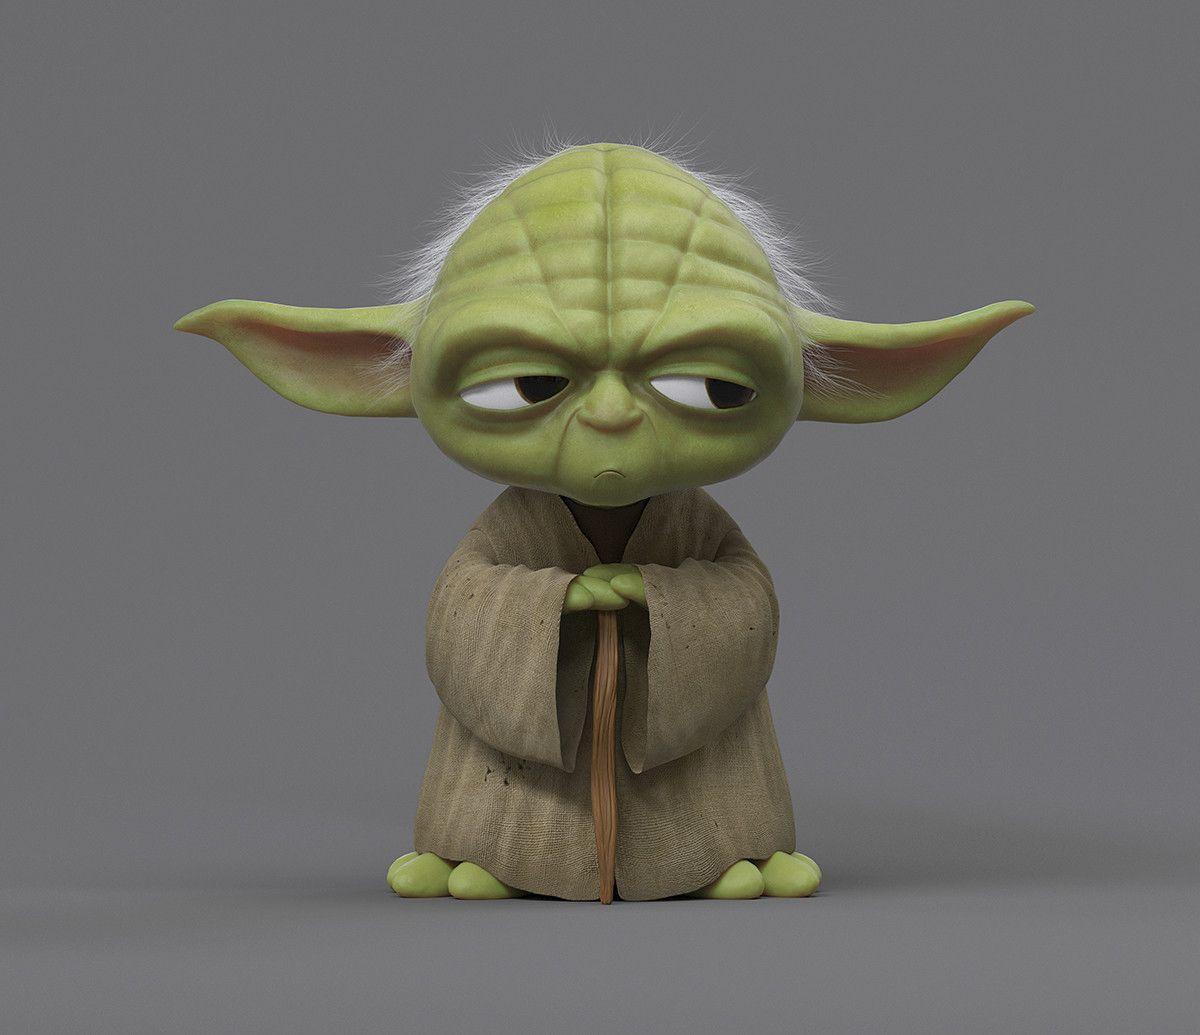 Jedi Grand Master Yoda Star Wars Starwars Starwarsart Starwarsfanart Yoda Jedi Star Wars Pictures Star Wars Wallpaper Star Wars Art